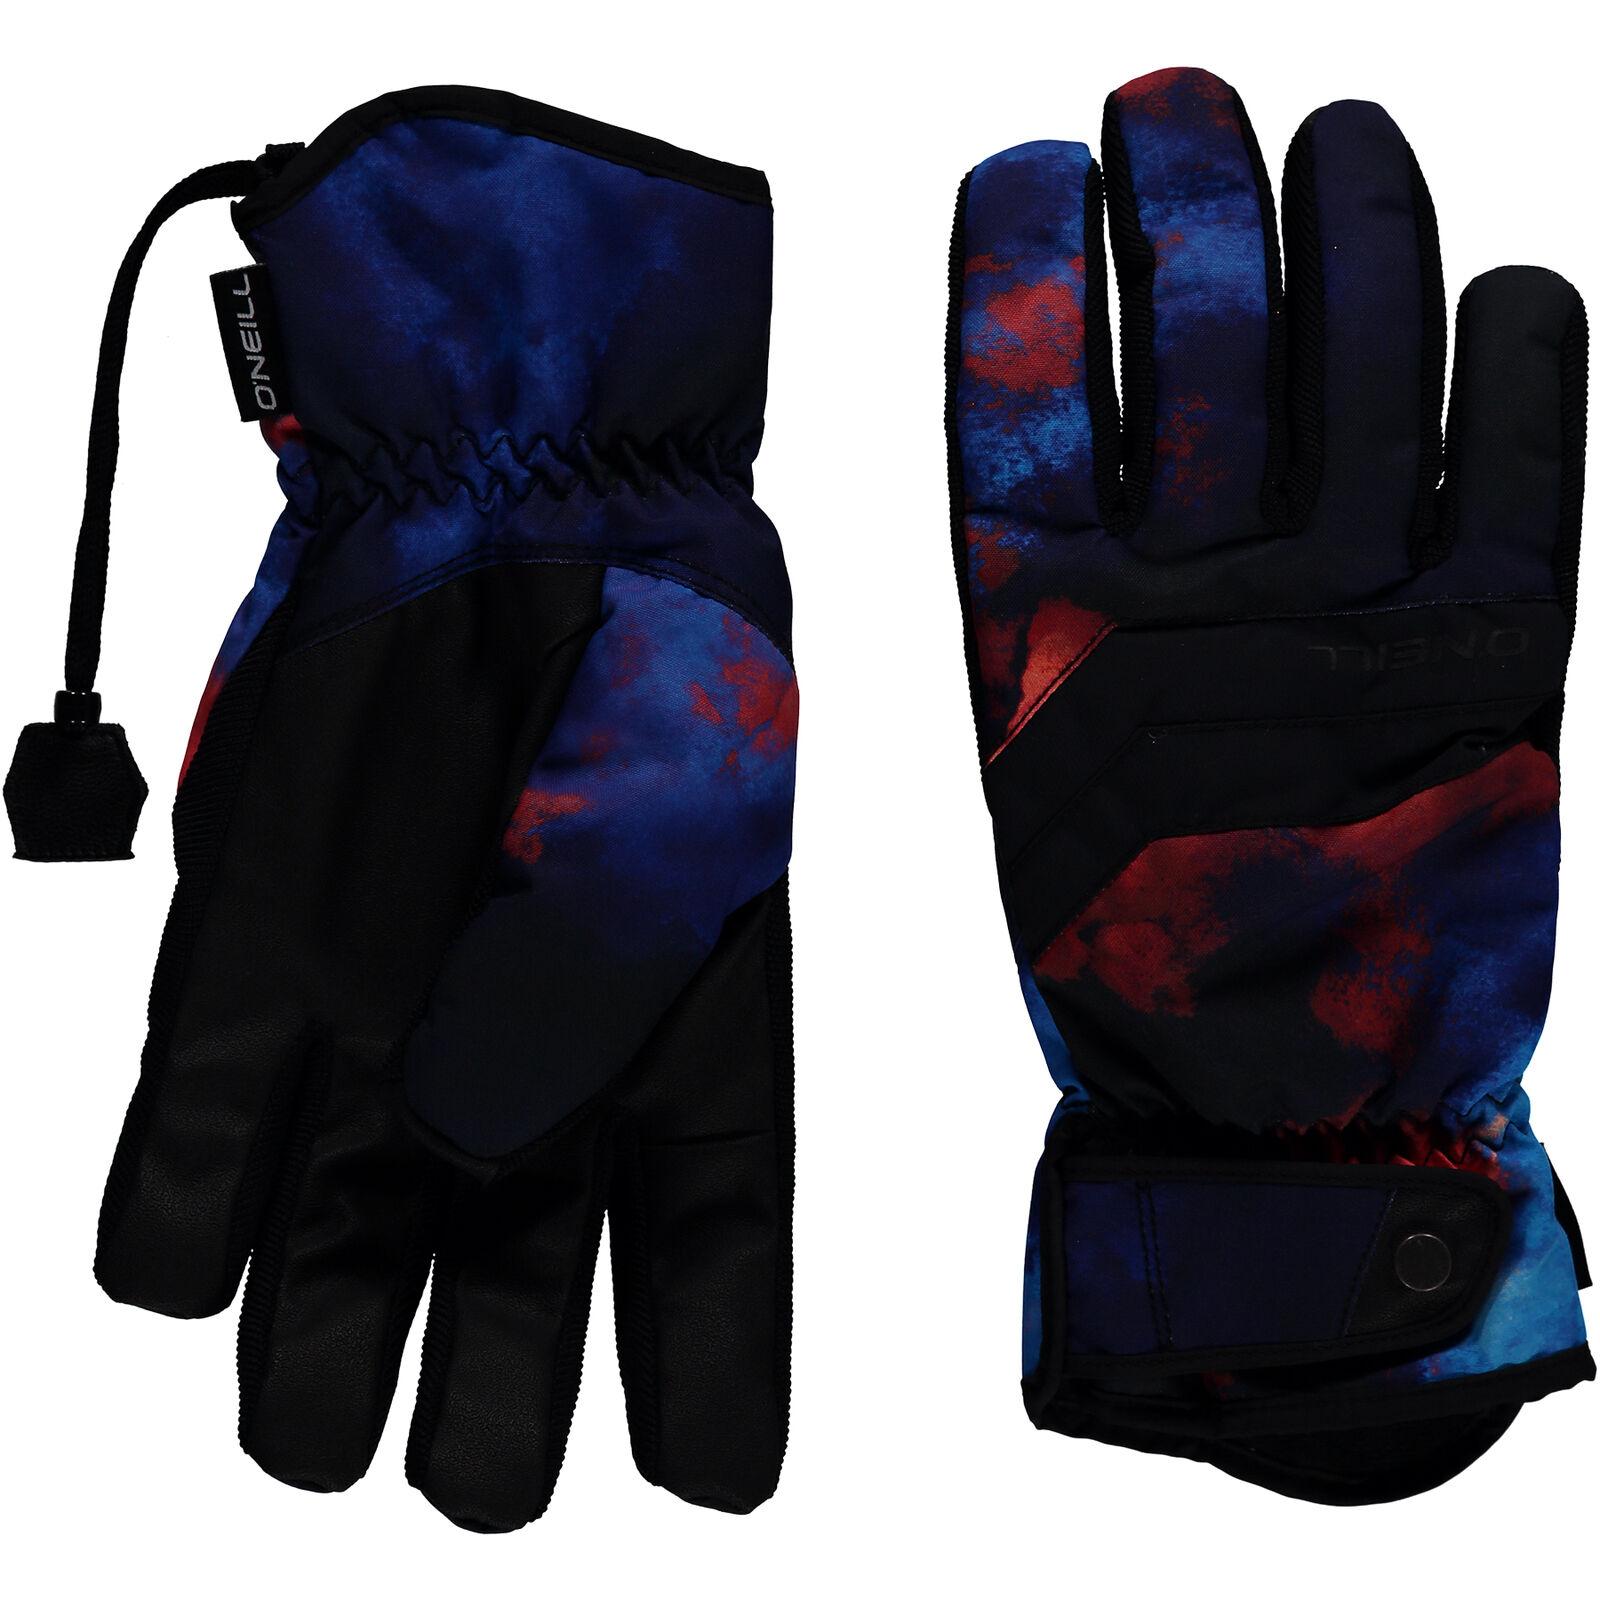 O'Neill Handschuh FREESTYLE  BM FREESTYLE Handschuh GLOVES dunkelblau Grafikmuster 76ba3c